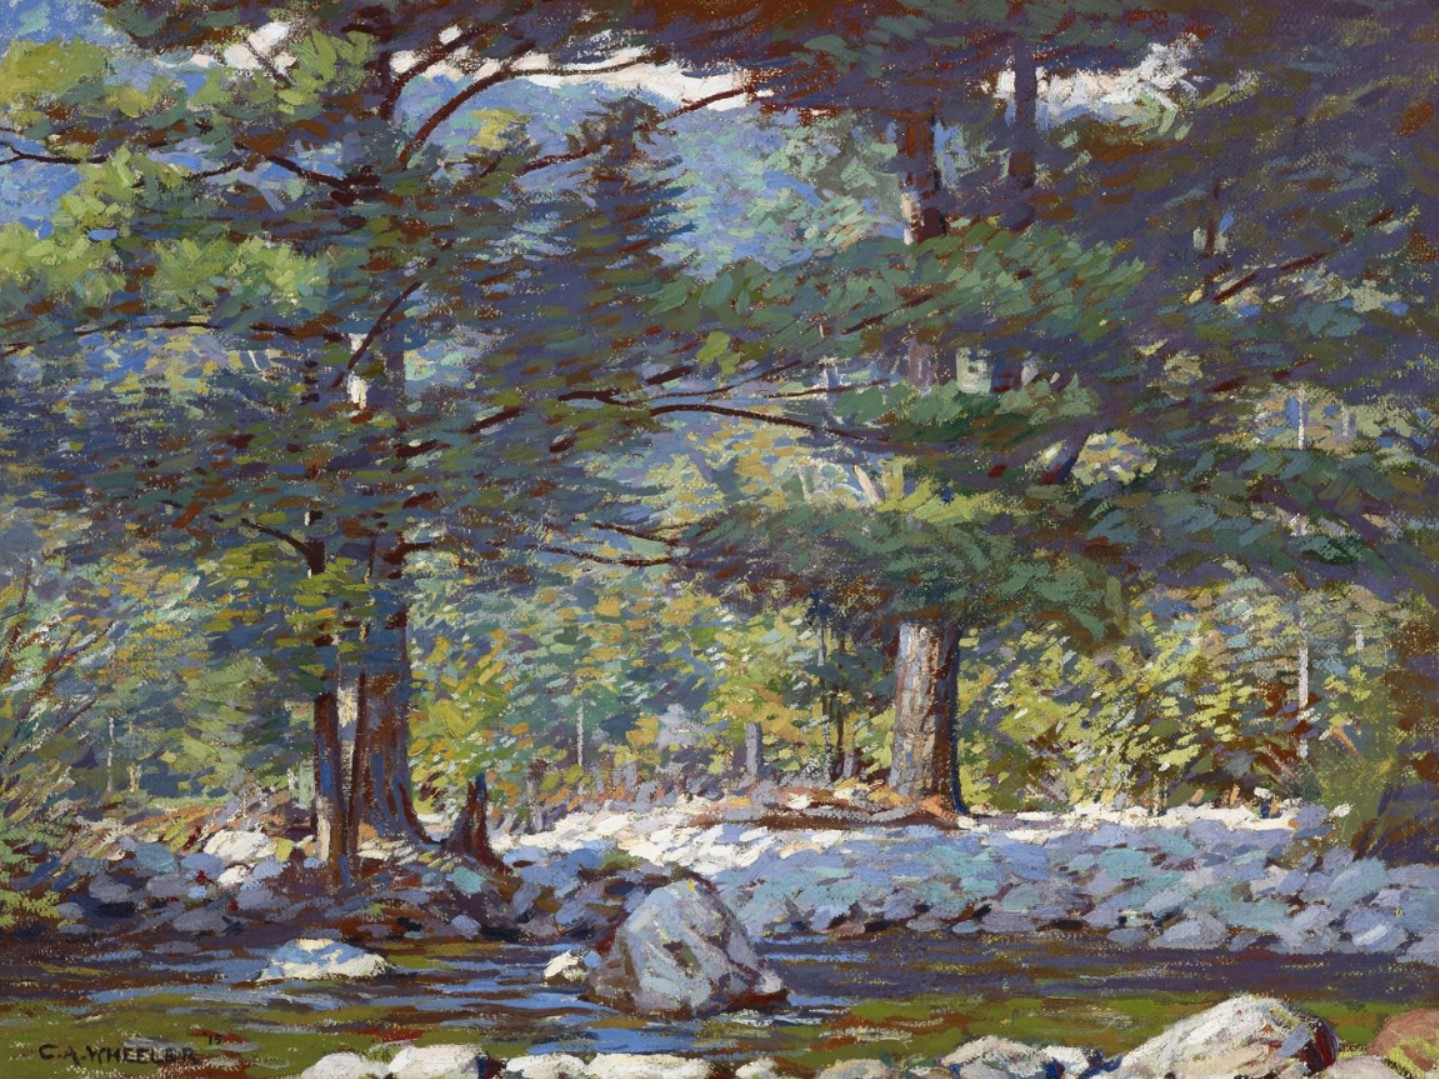 Clifton Wheeler клифтон Уилер американский импрессионизм художник картина пейзажи природы Альберт Сафиуллин